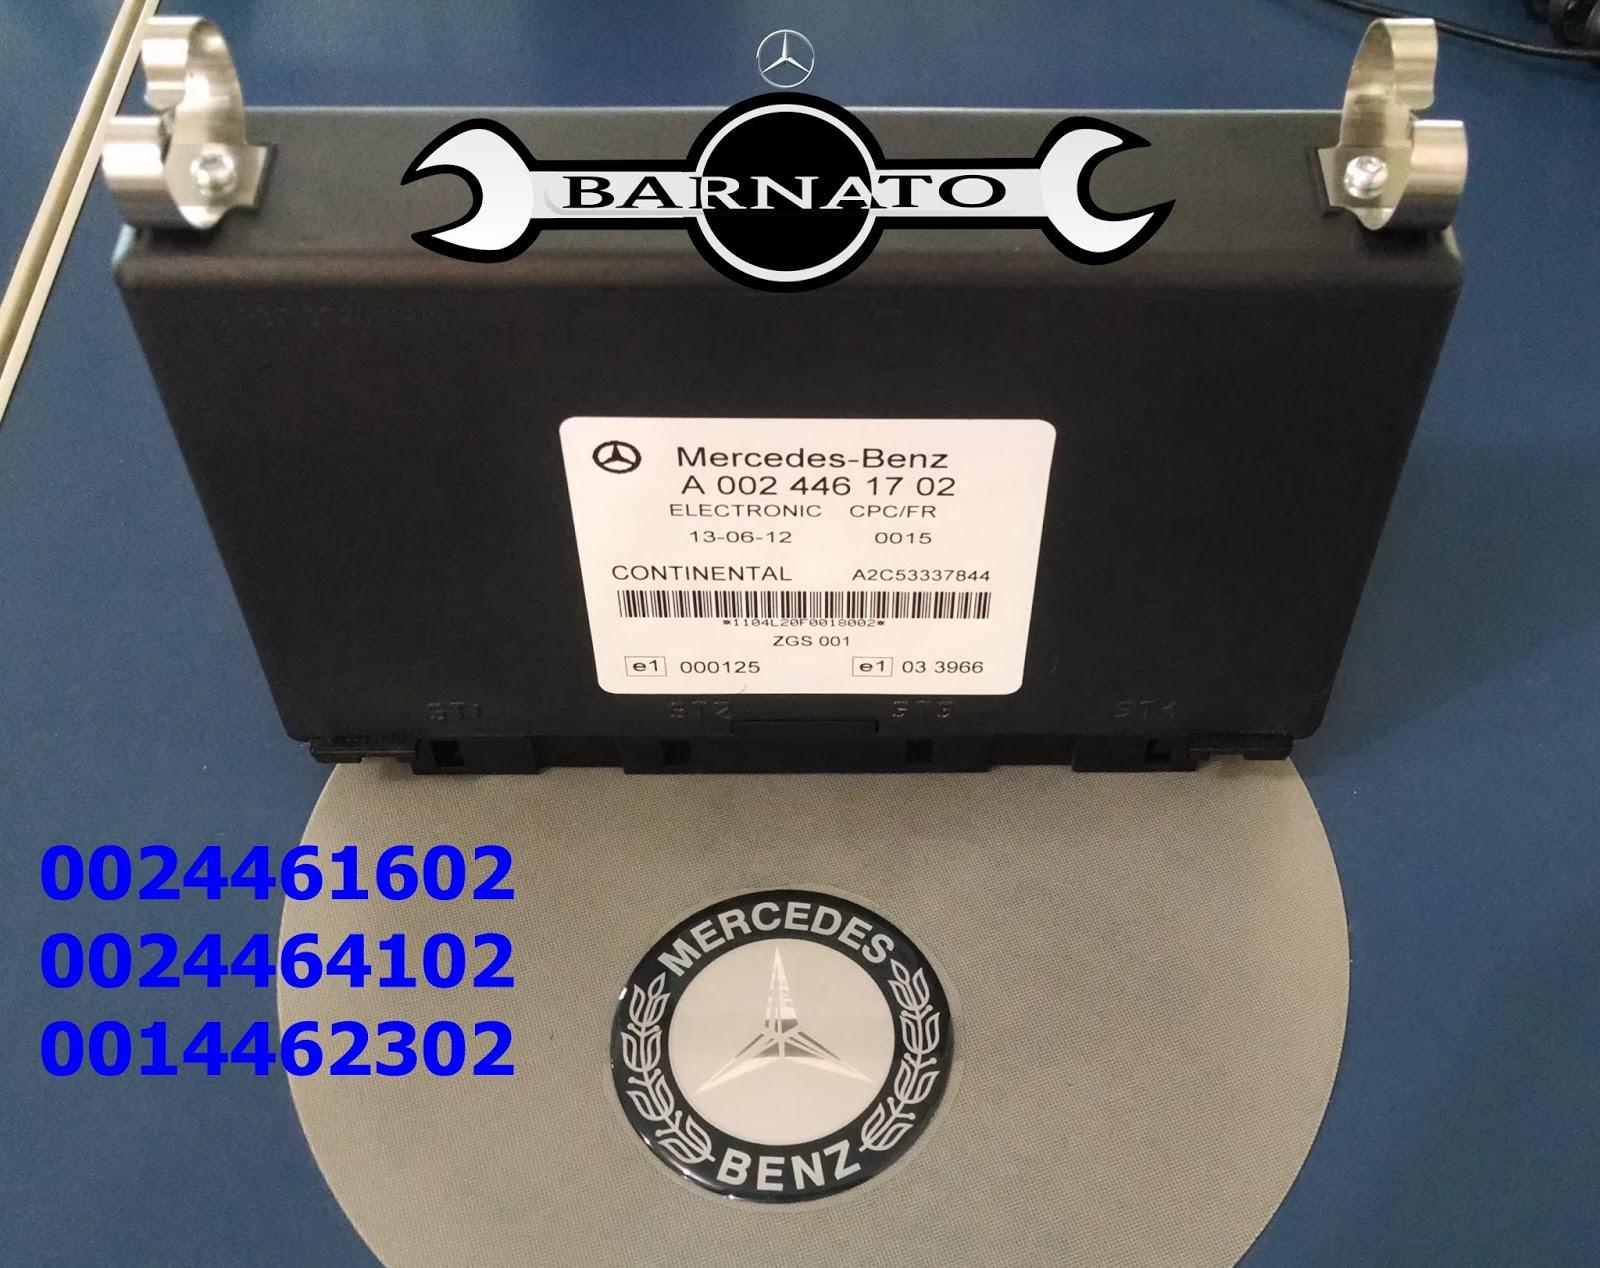 http://www.barnatoloja.com.br/produto.php?cod_produto=6425692